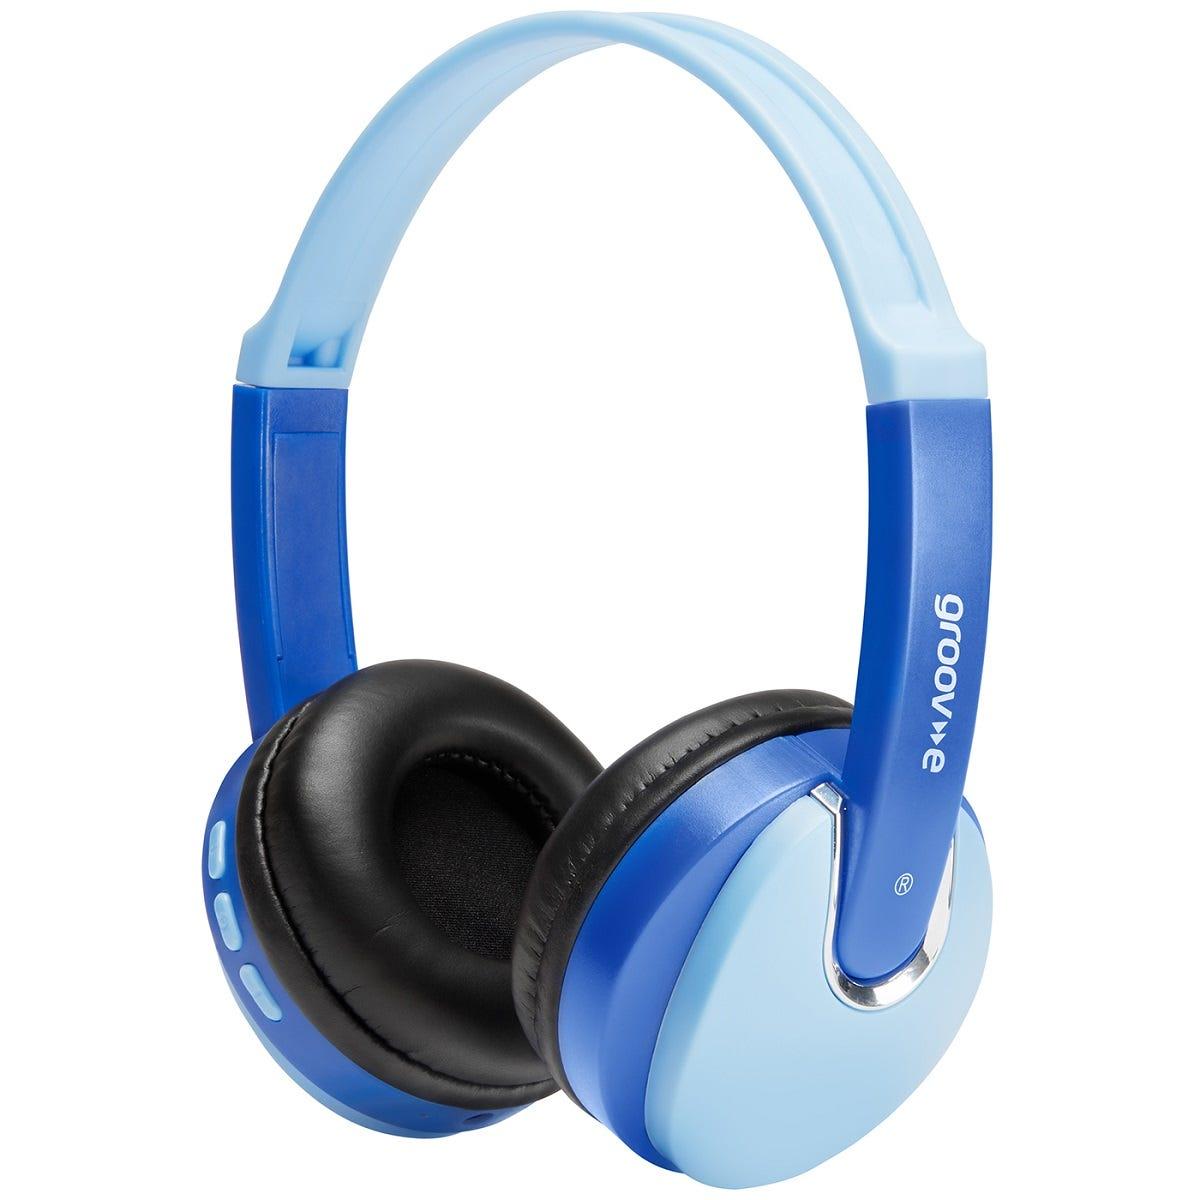 Groov-e Kids Wireless DJ Style Bluetooth Headphones - Blue